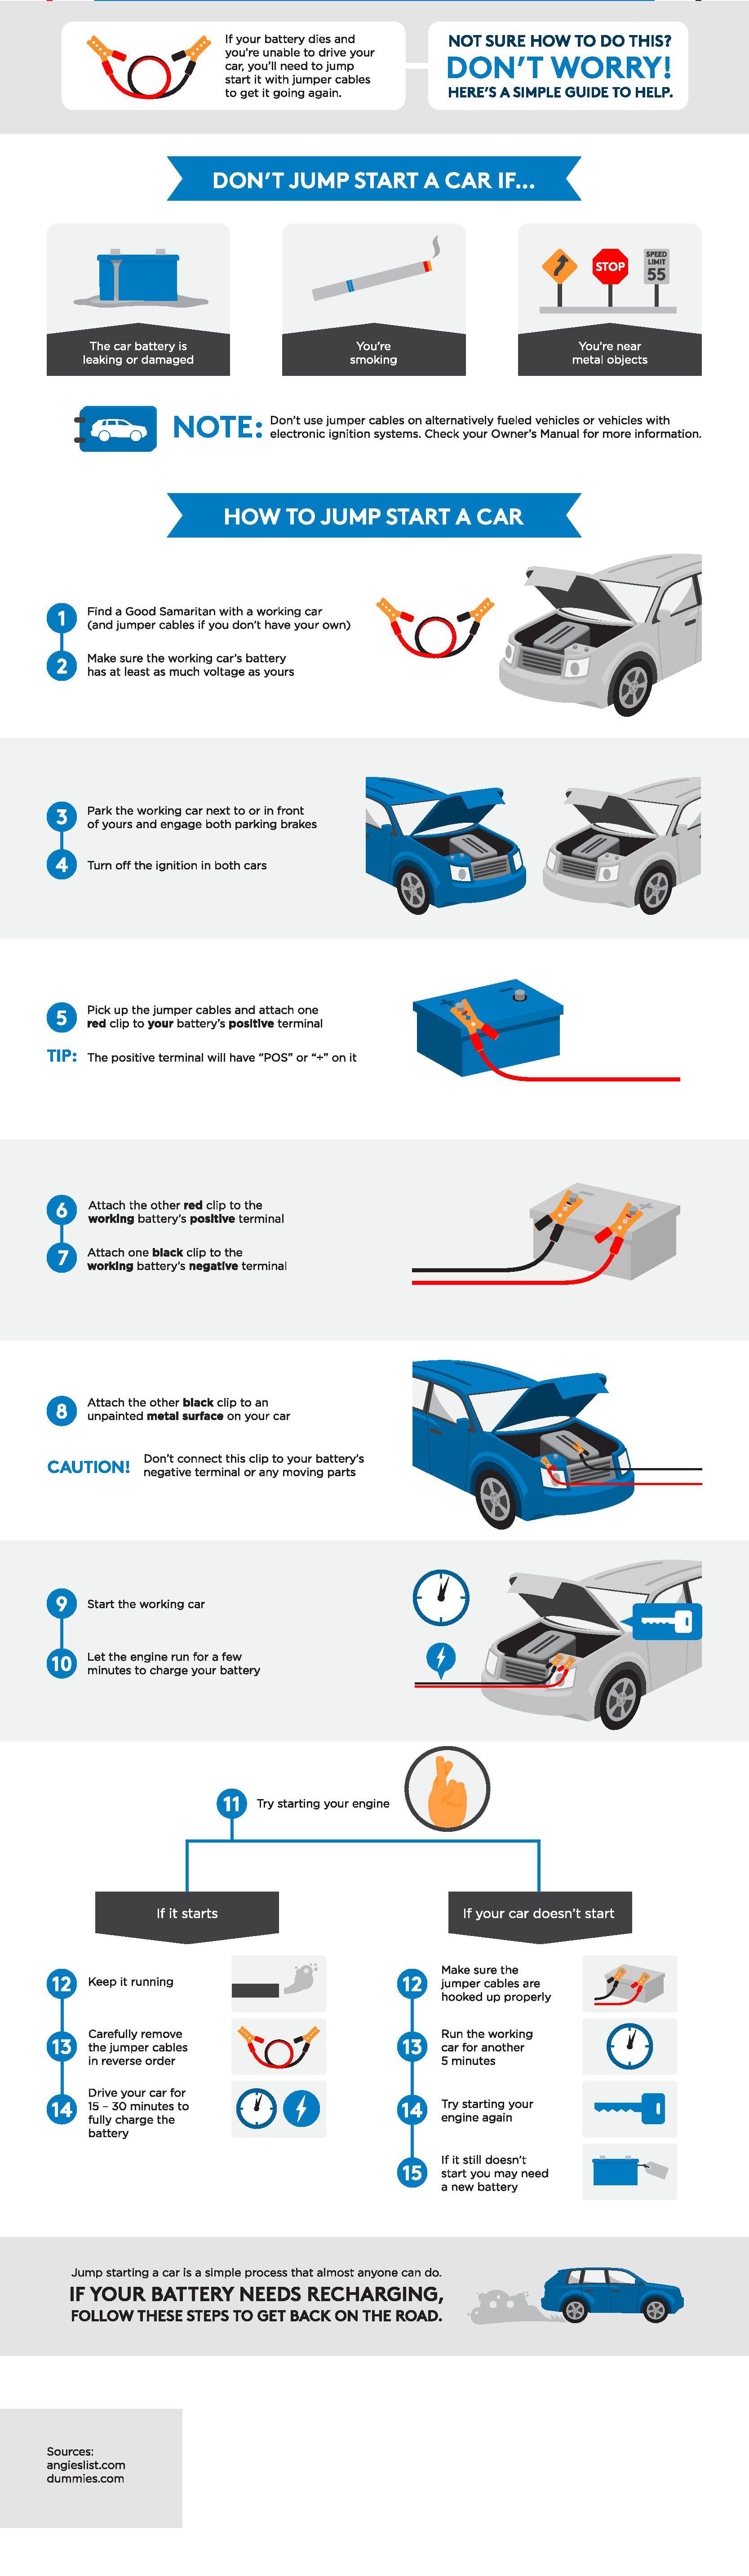 How To Jump Start A Car Stan Mcnabb Cdjr Blog